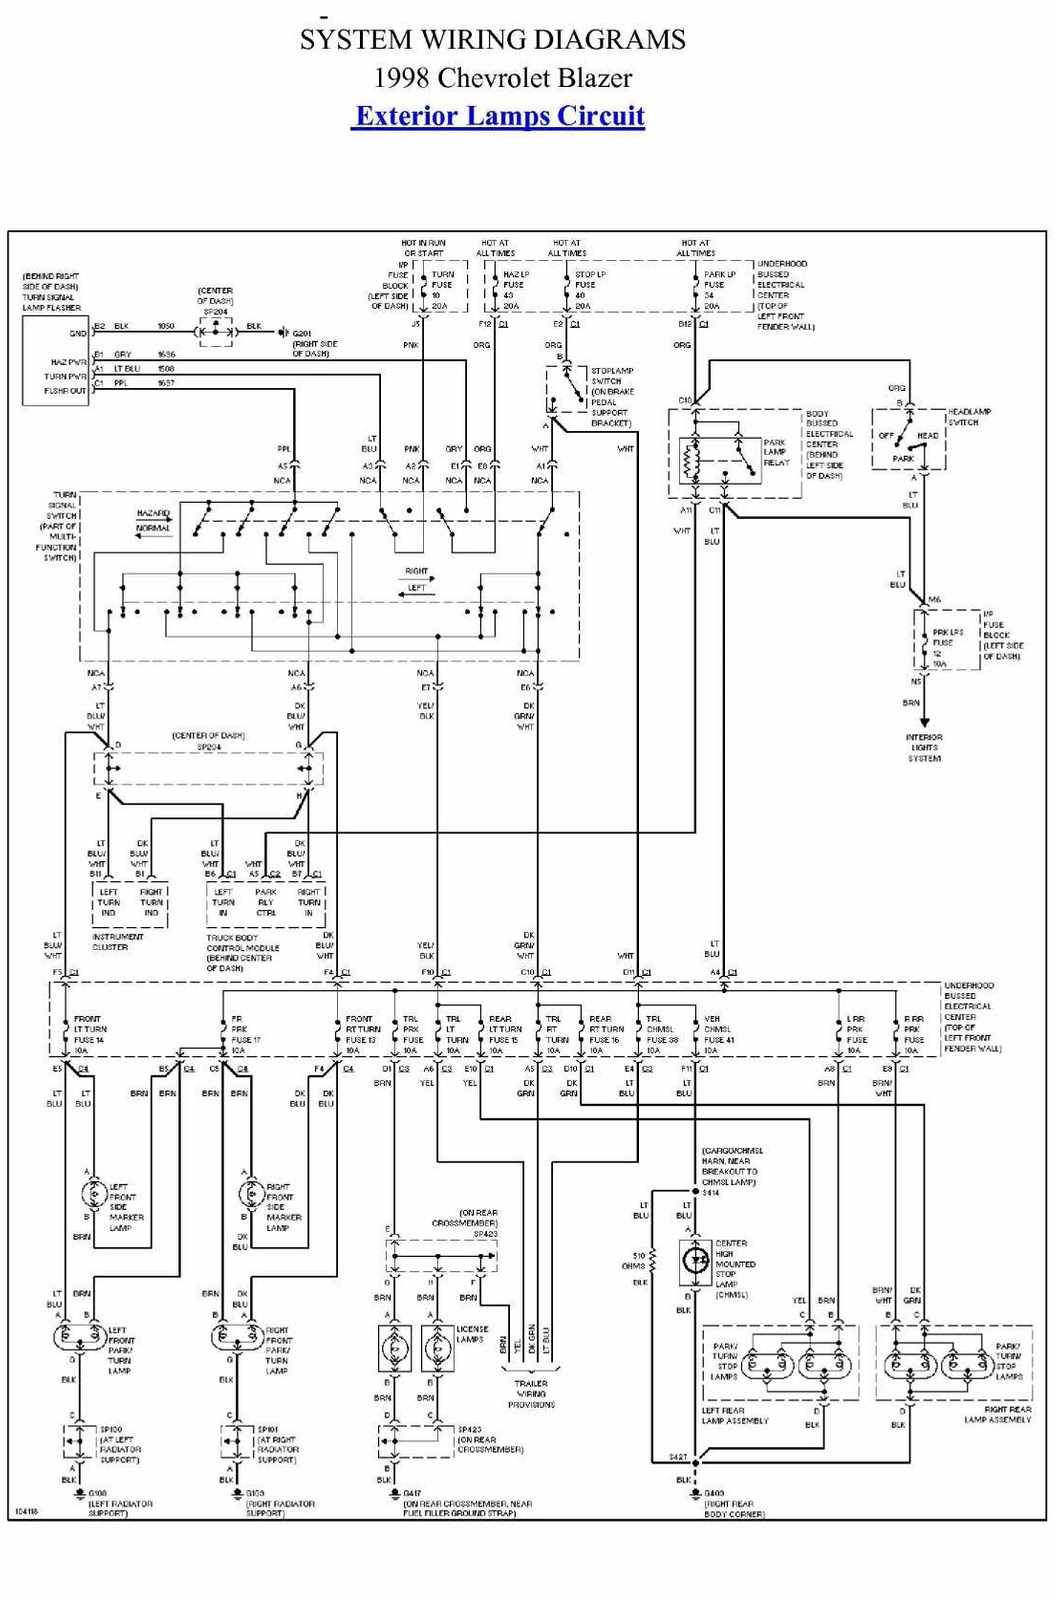 Wiring Diagram 93 K5 Blazer And Schematics Ssr 90 Fuse Box Elsavadorla